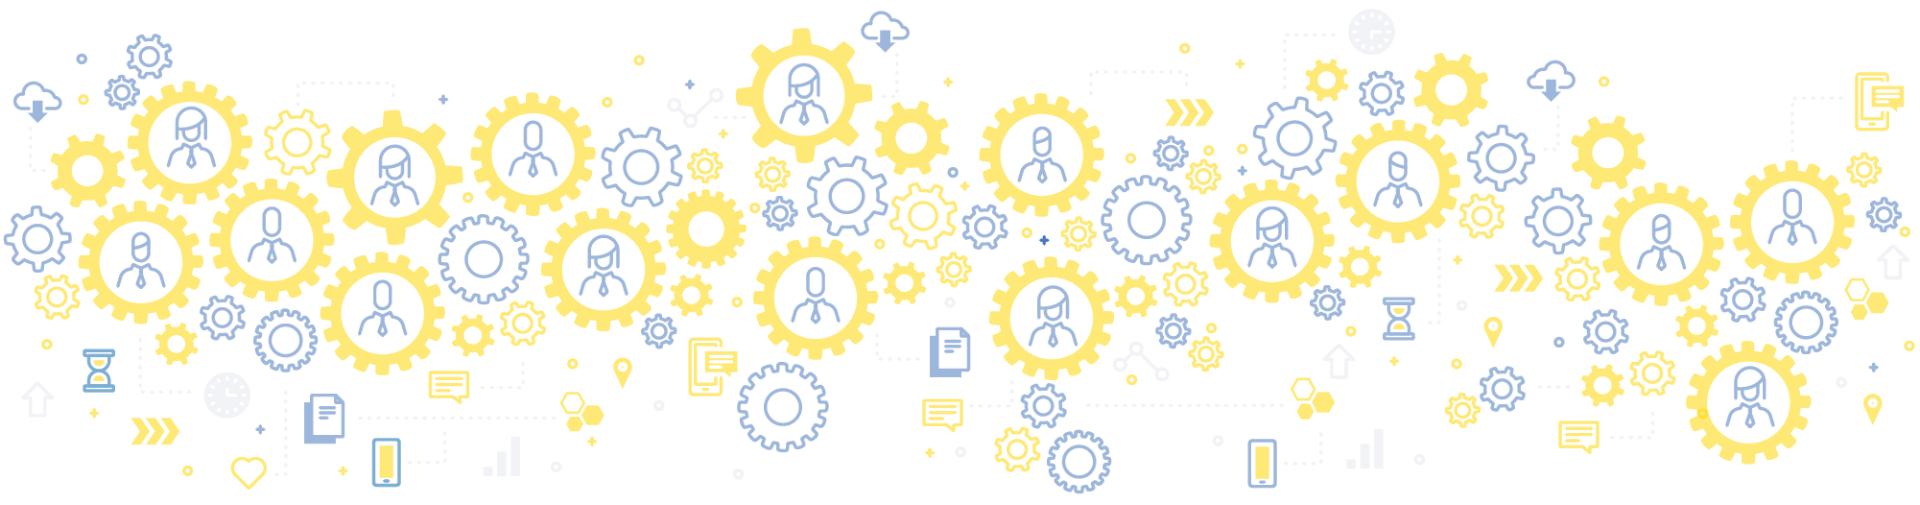 [Roundup] 20 Must-Use Free Digital Marketing Tools